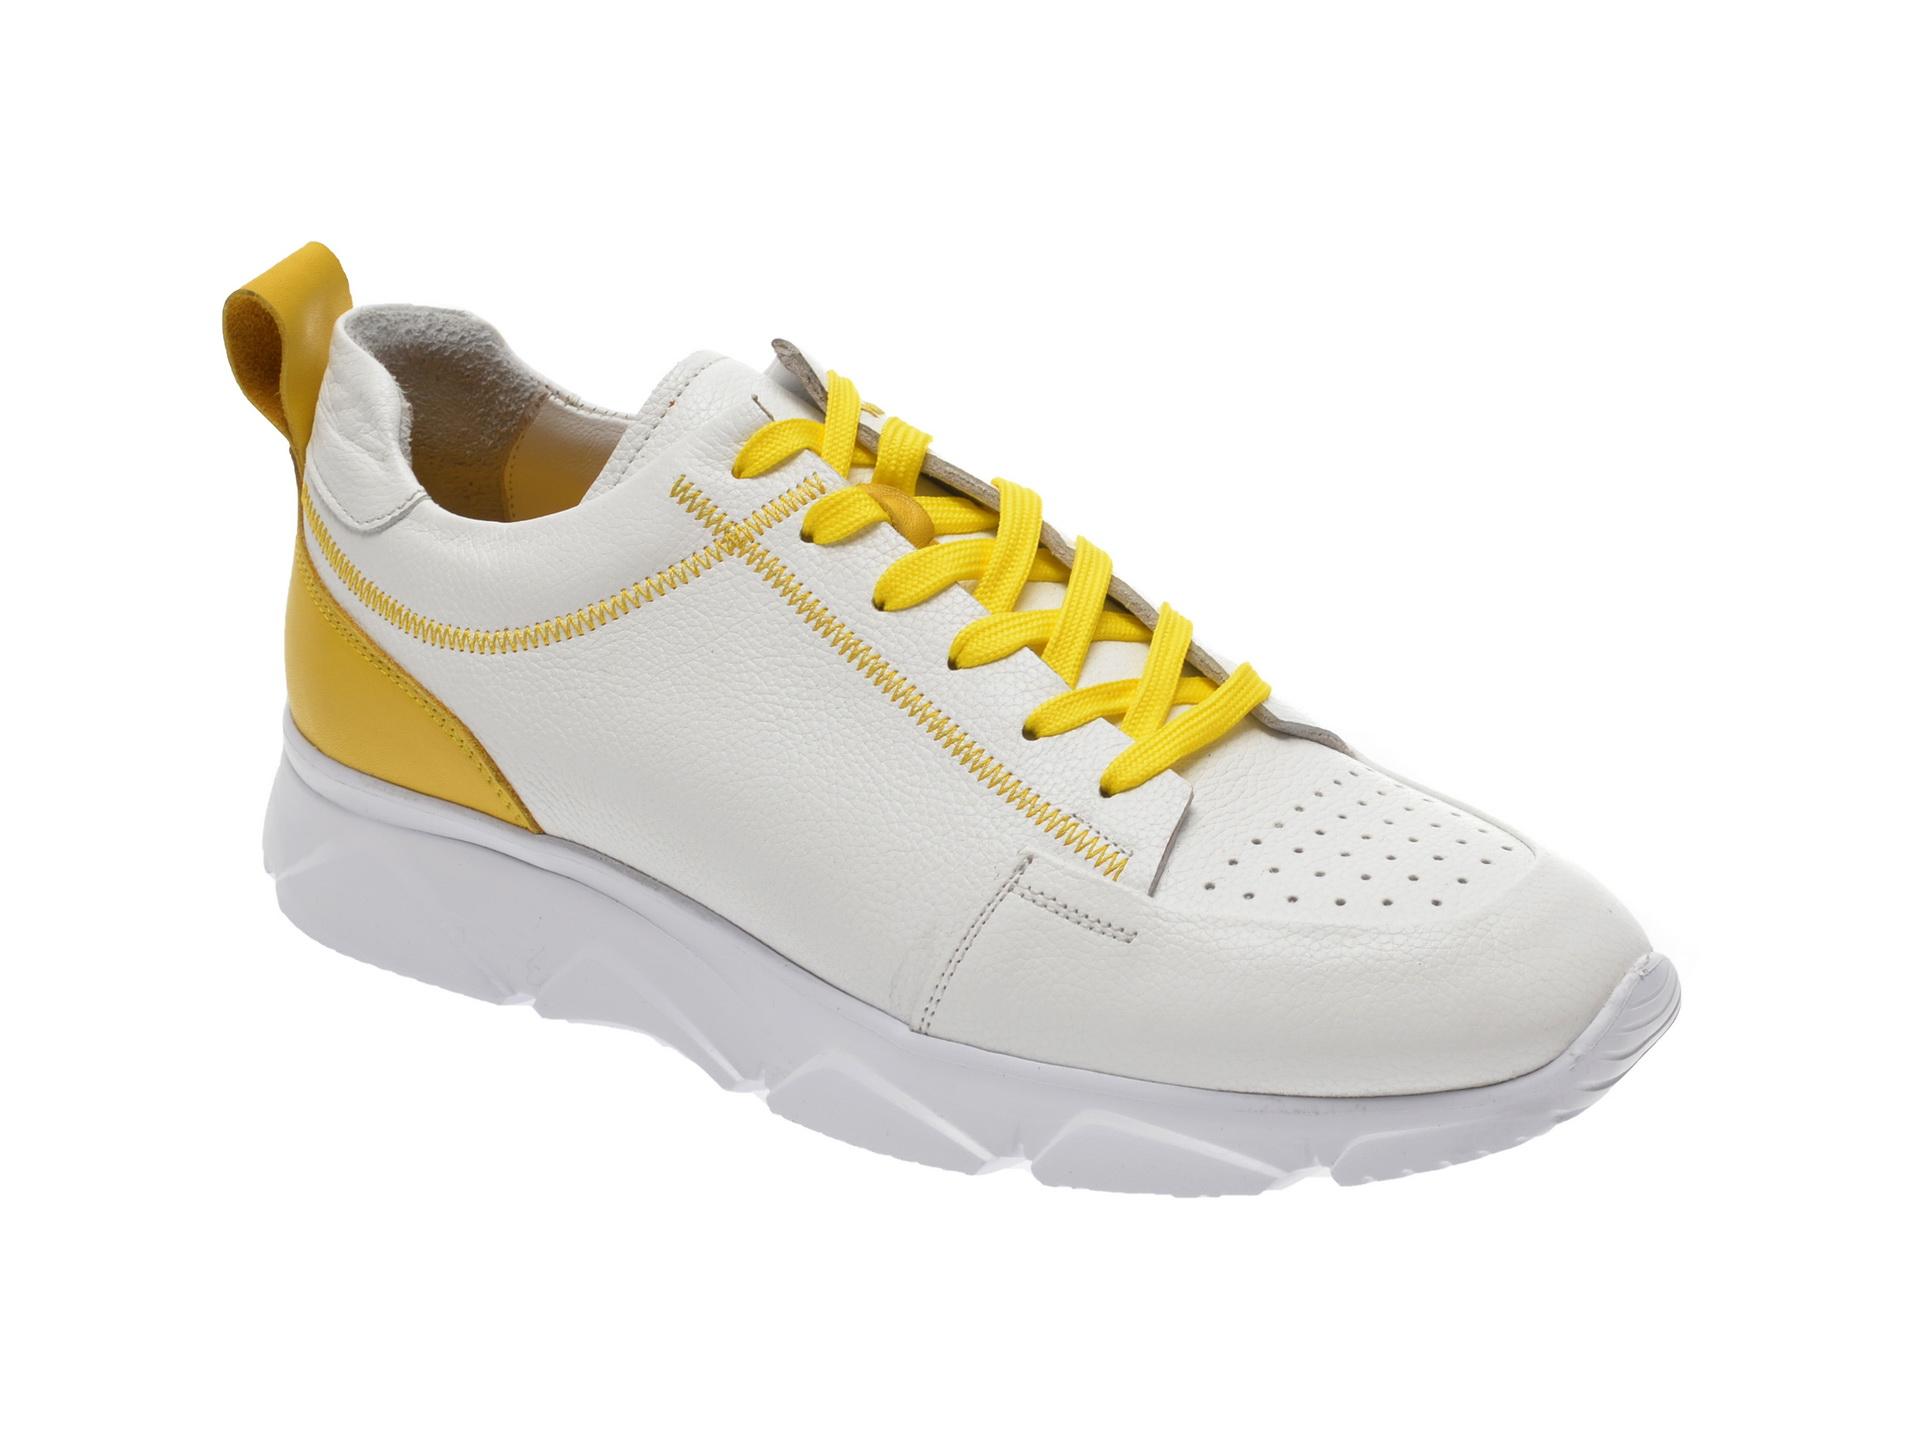 Pantofi sport OTTER albi, 137, din piele naturala imagine